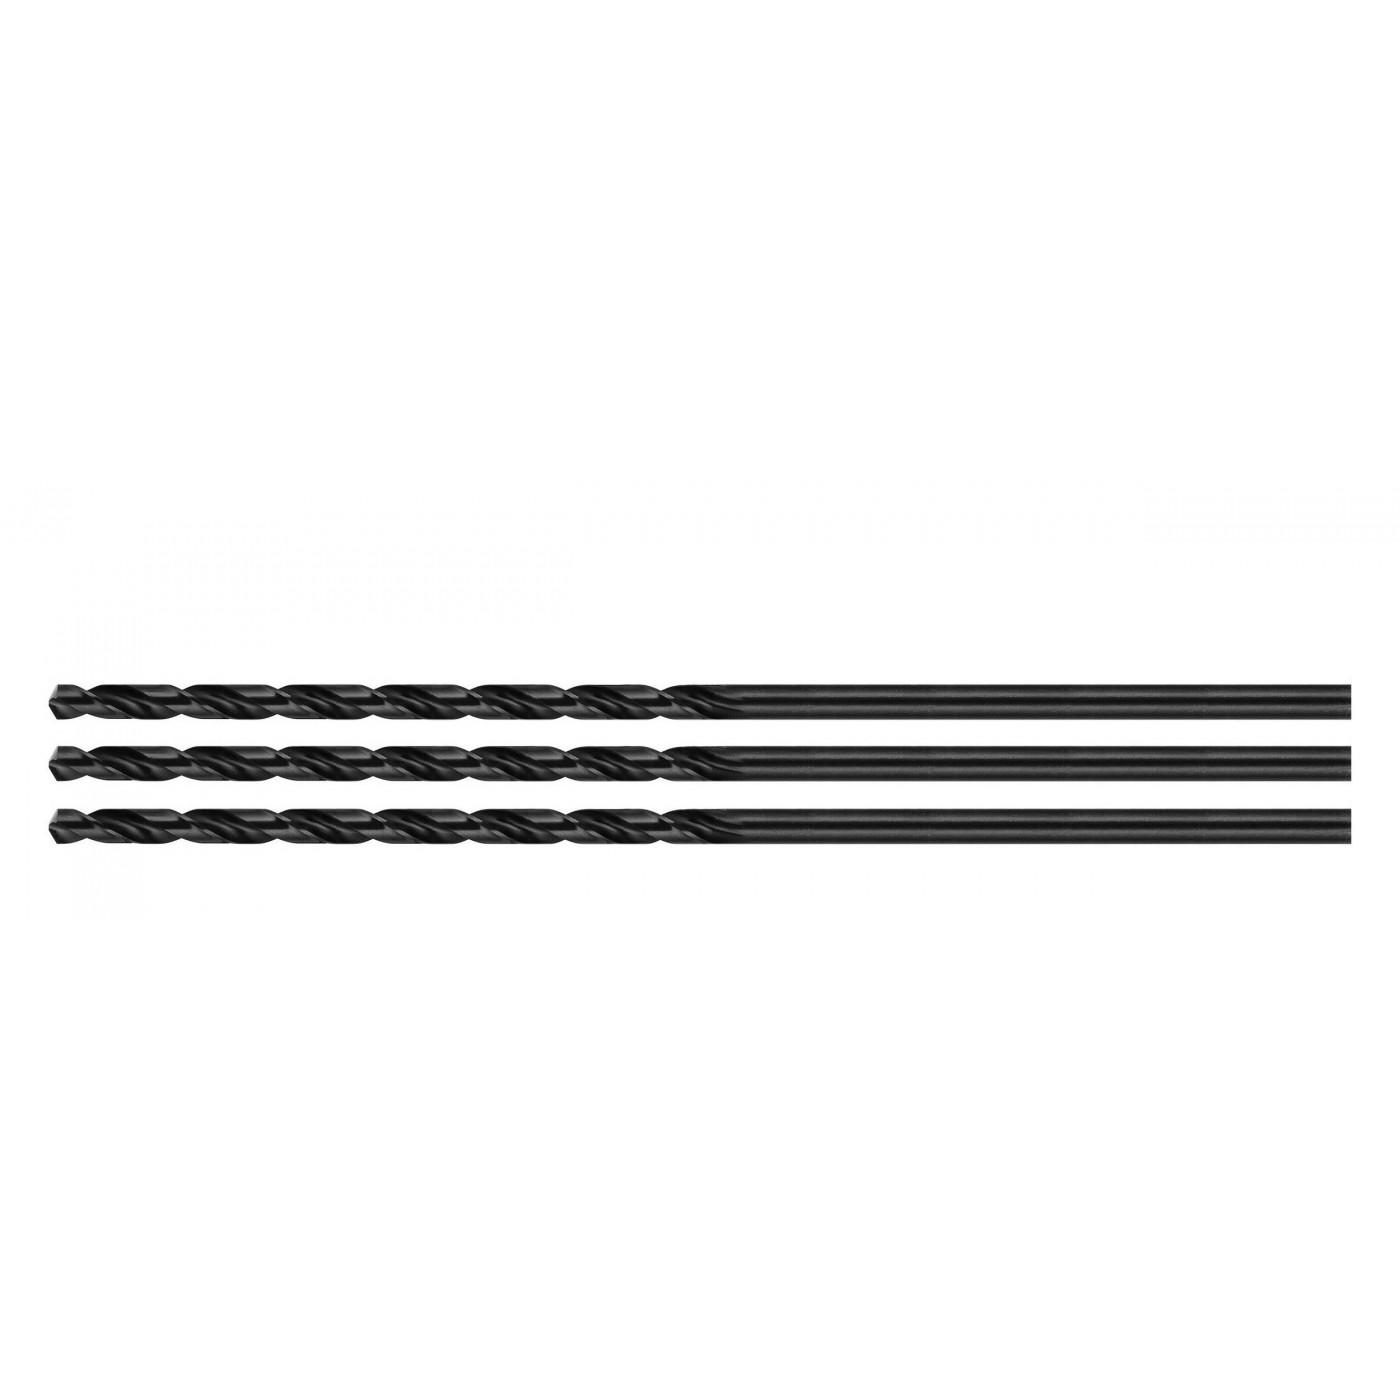 Set of 3 metal drill bits, extra long (5.5x250 mm)  - 1